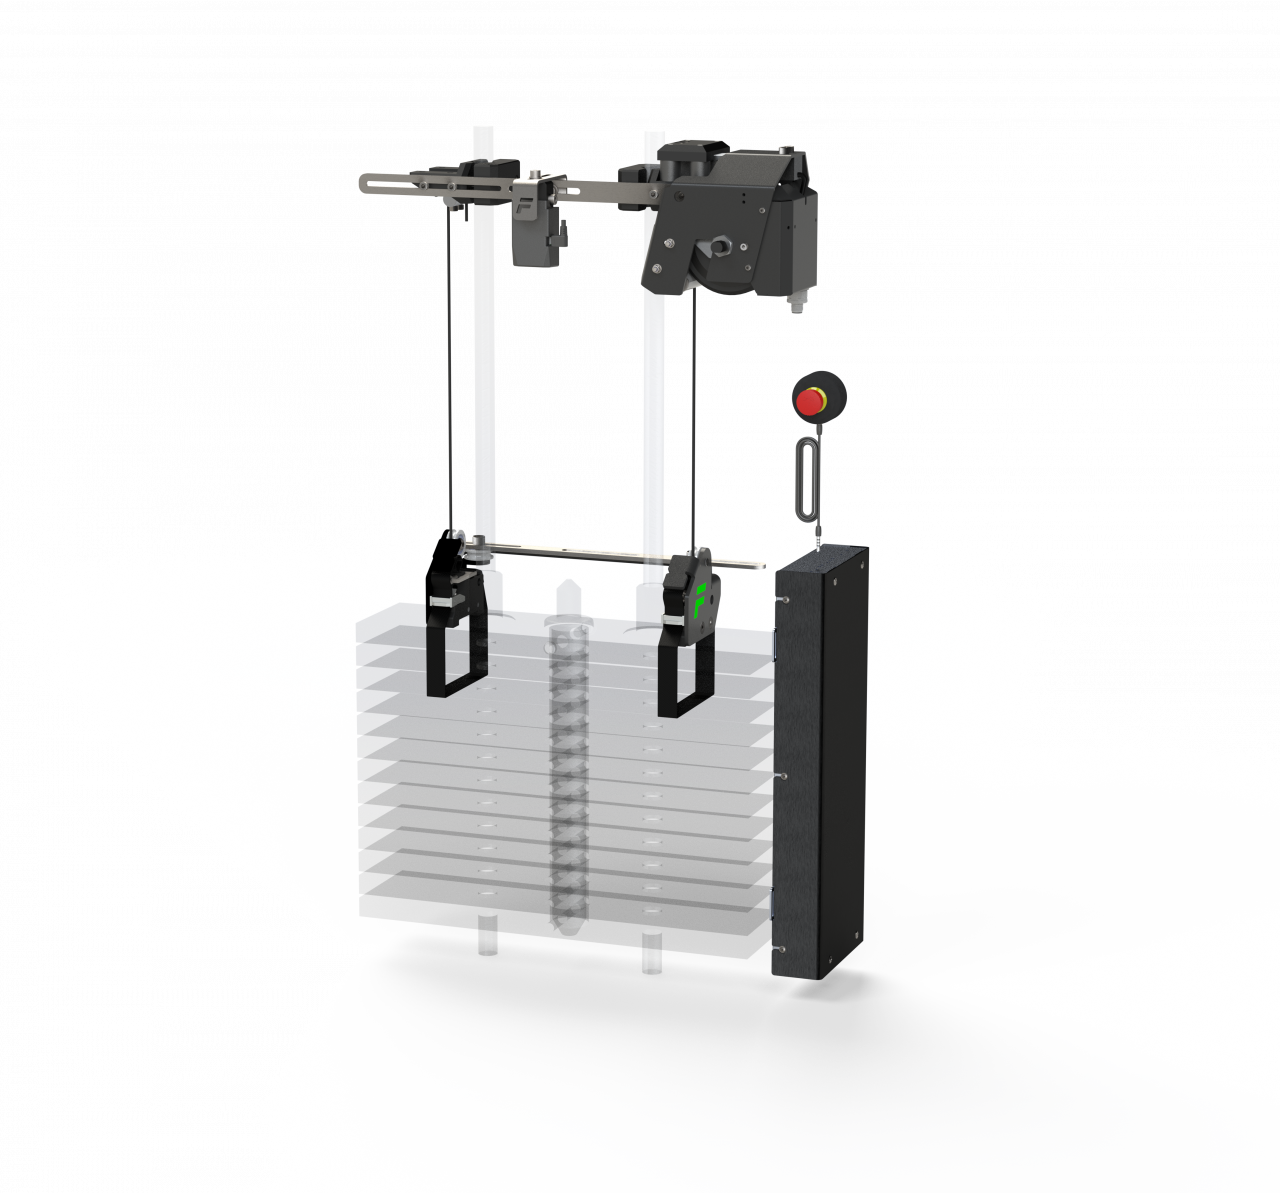 FYNAMICS Nachrüstlösung - Upgrade für Krafttrainingsgeräte